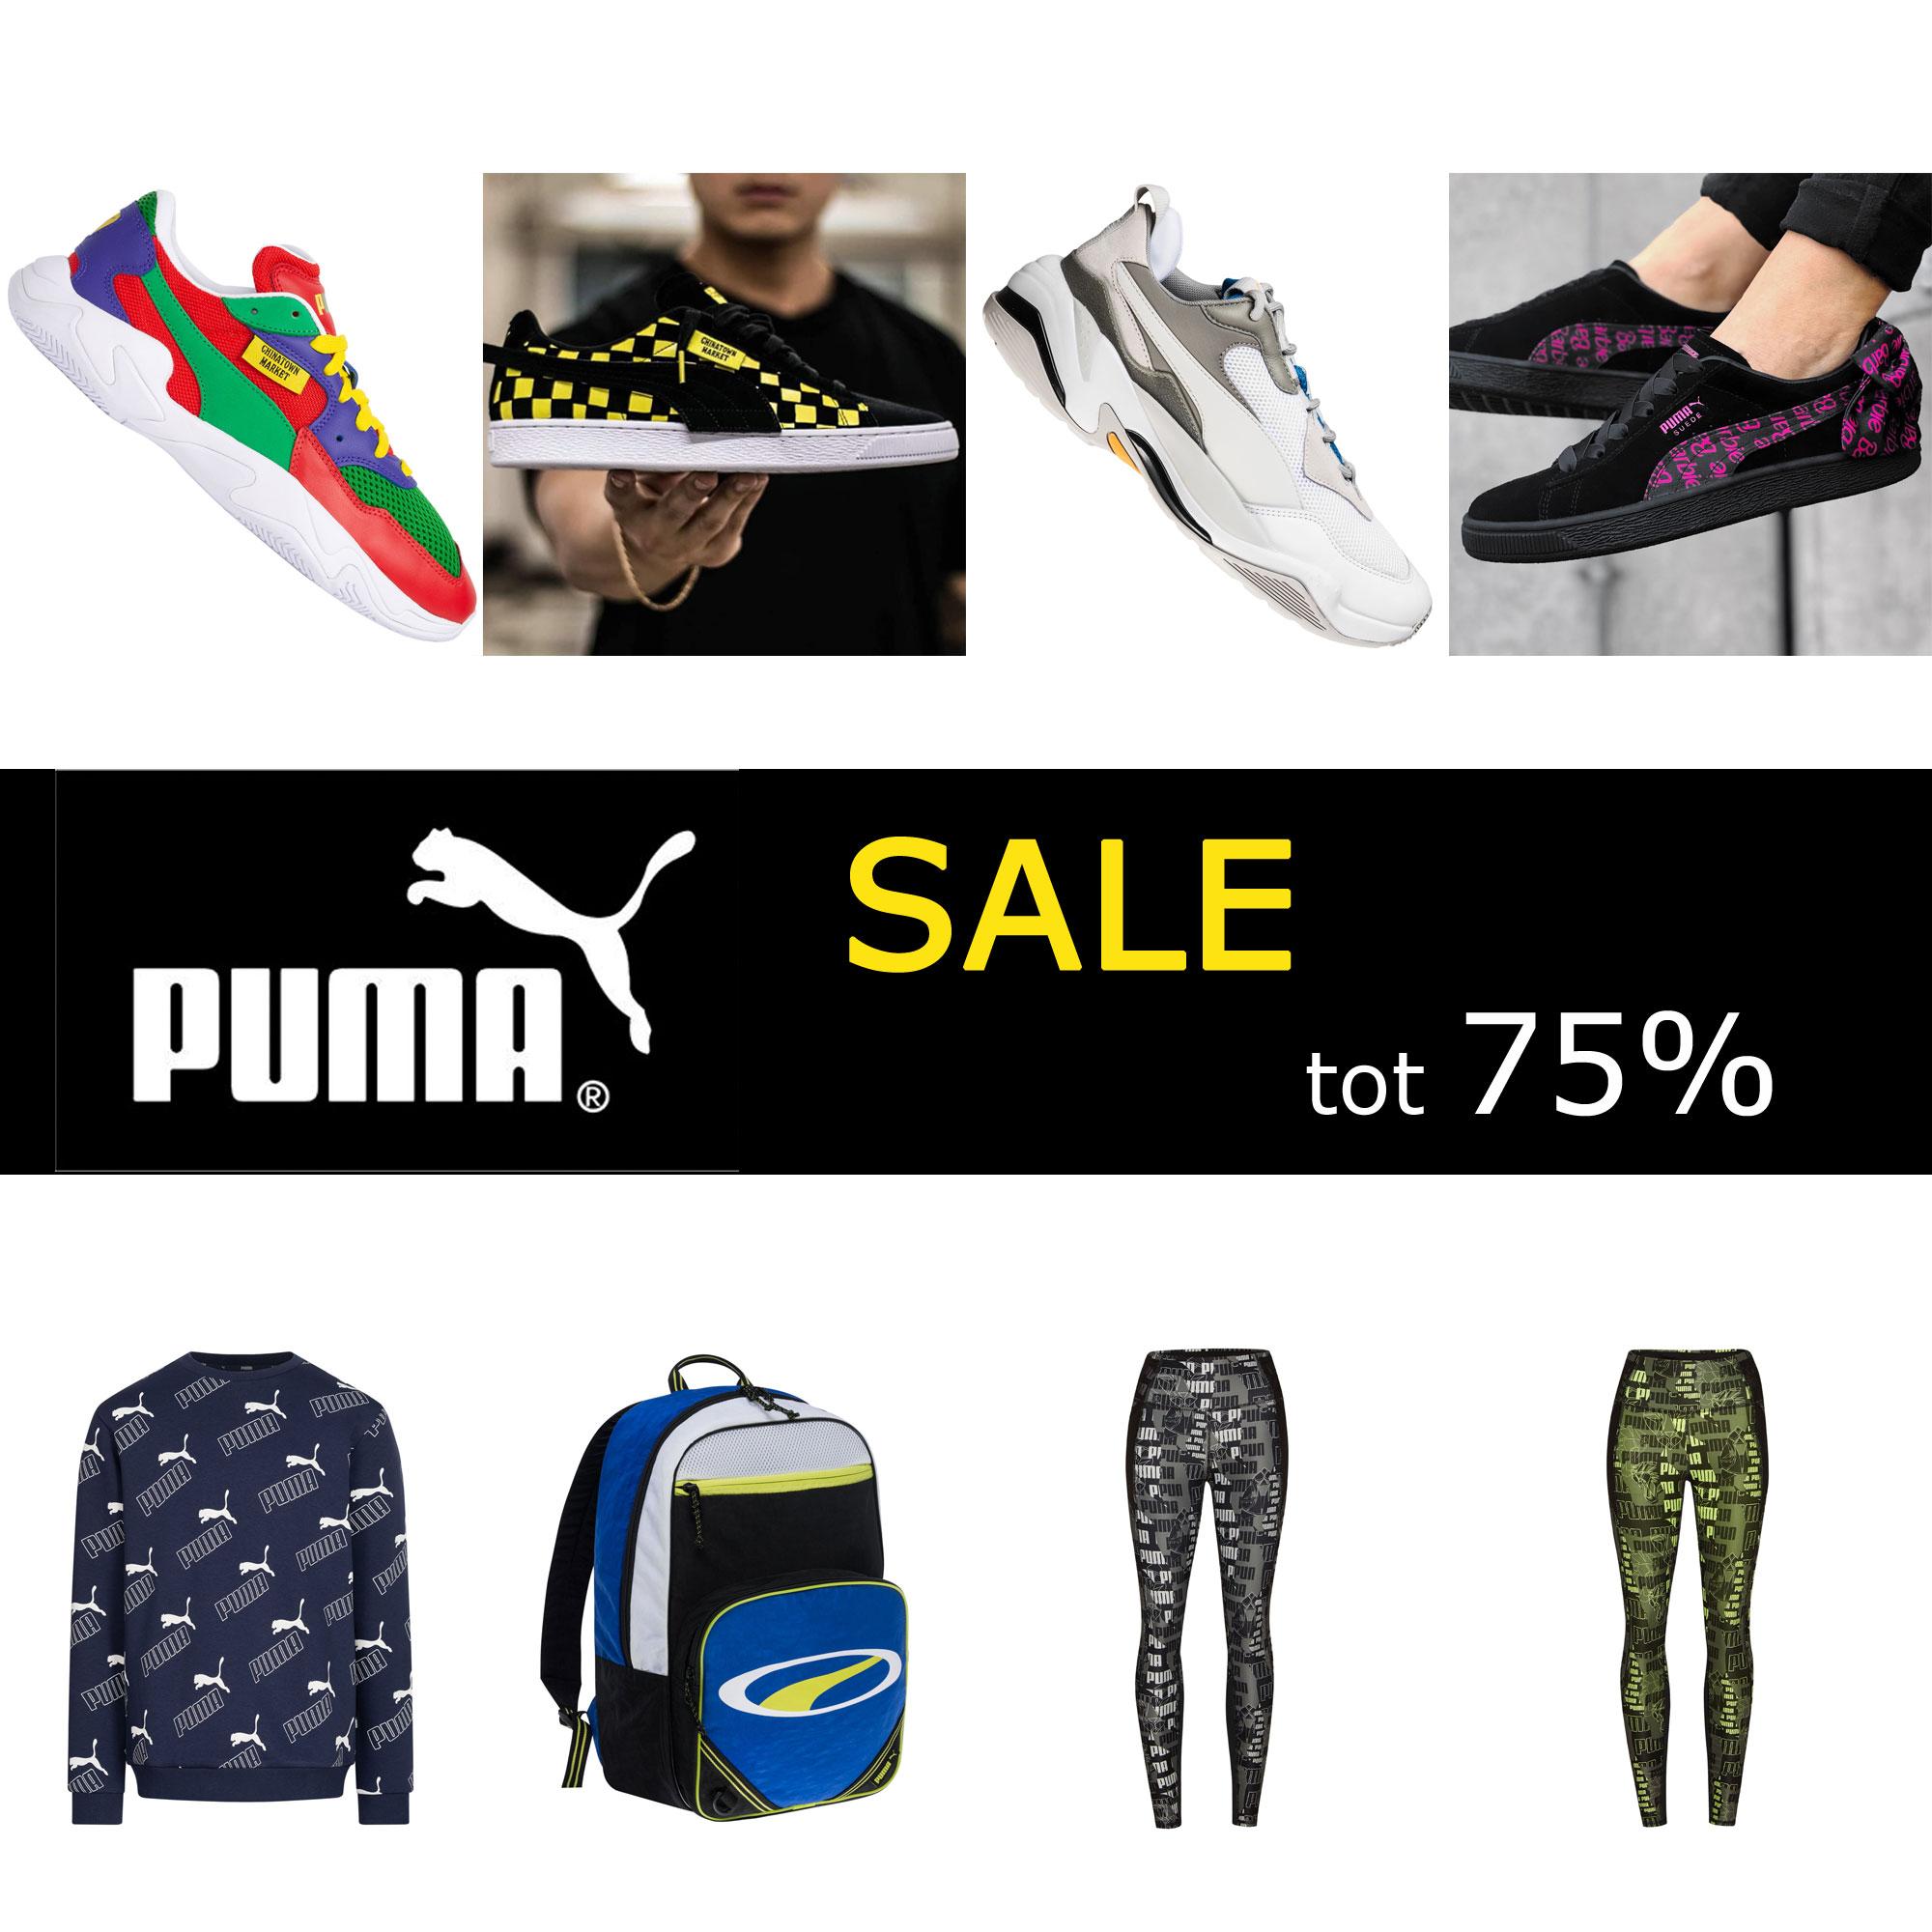 Puma SALE: tot 75% korting o.a. sneakers dames // heren // kids